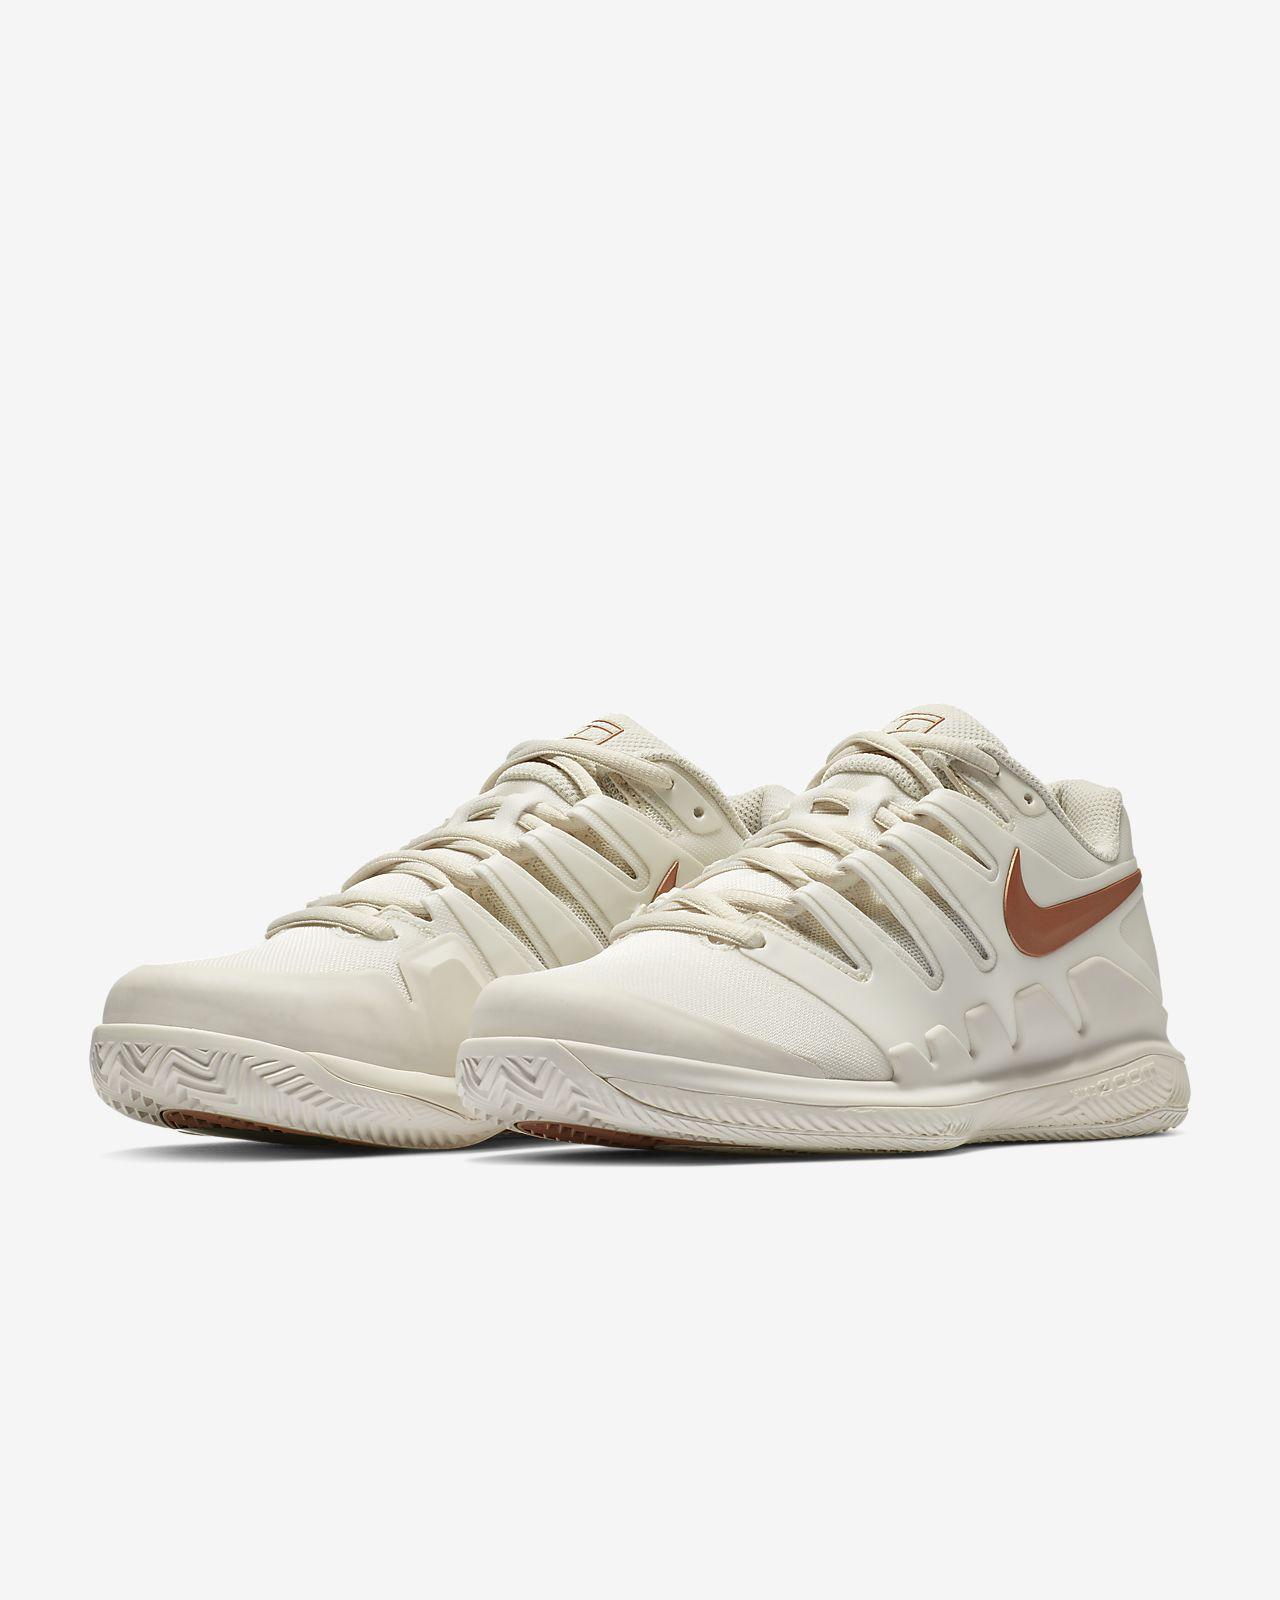 huge discount e1580 39192 ... Chaussure de tennis Nike Air Zoom Vapor X Clay pour Femme